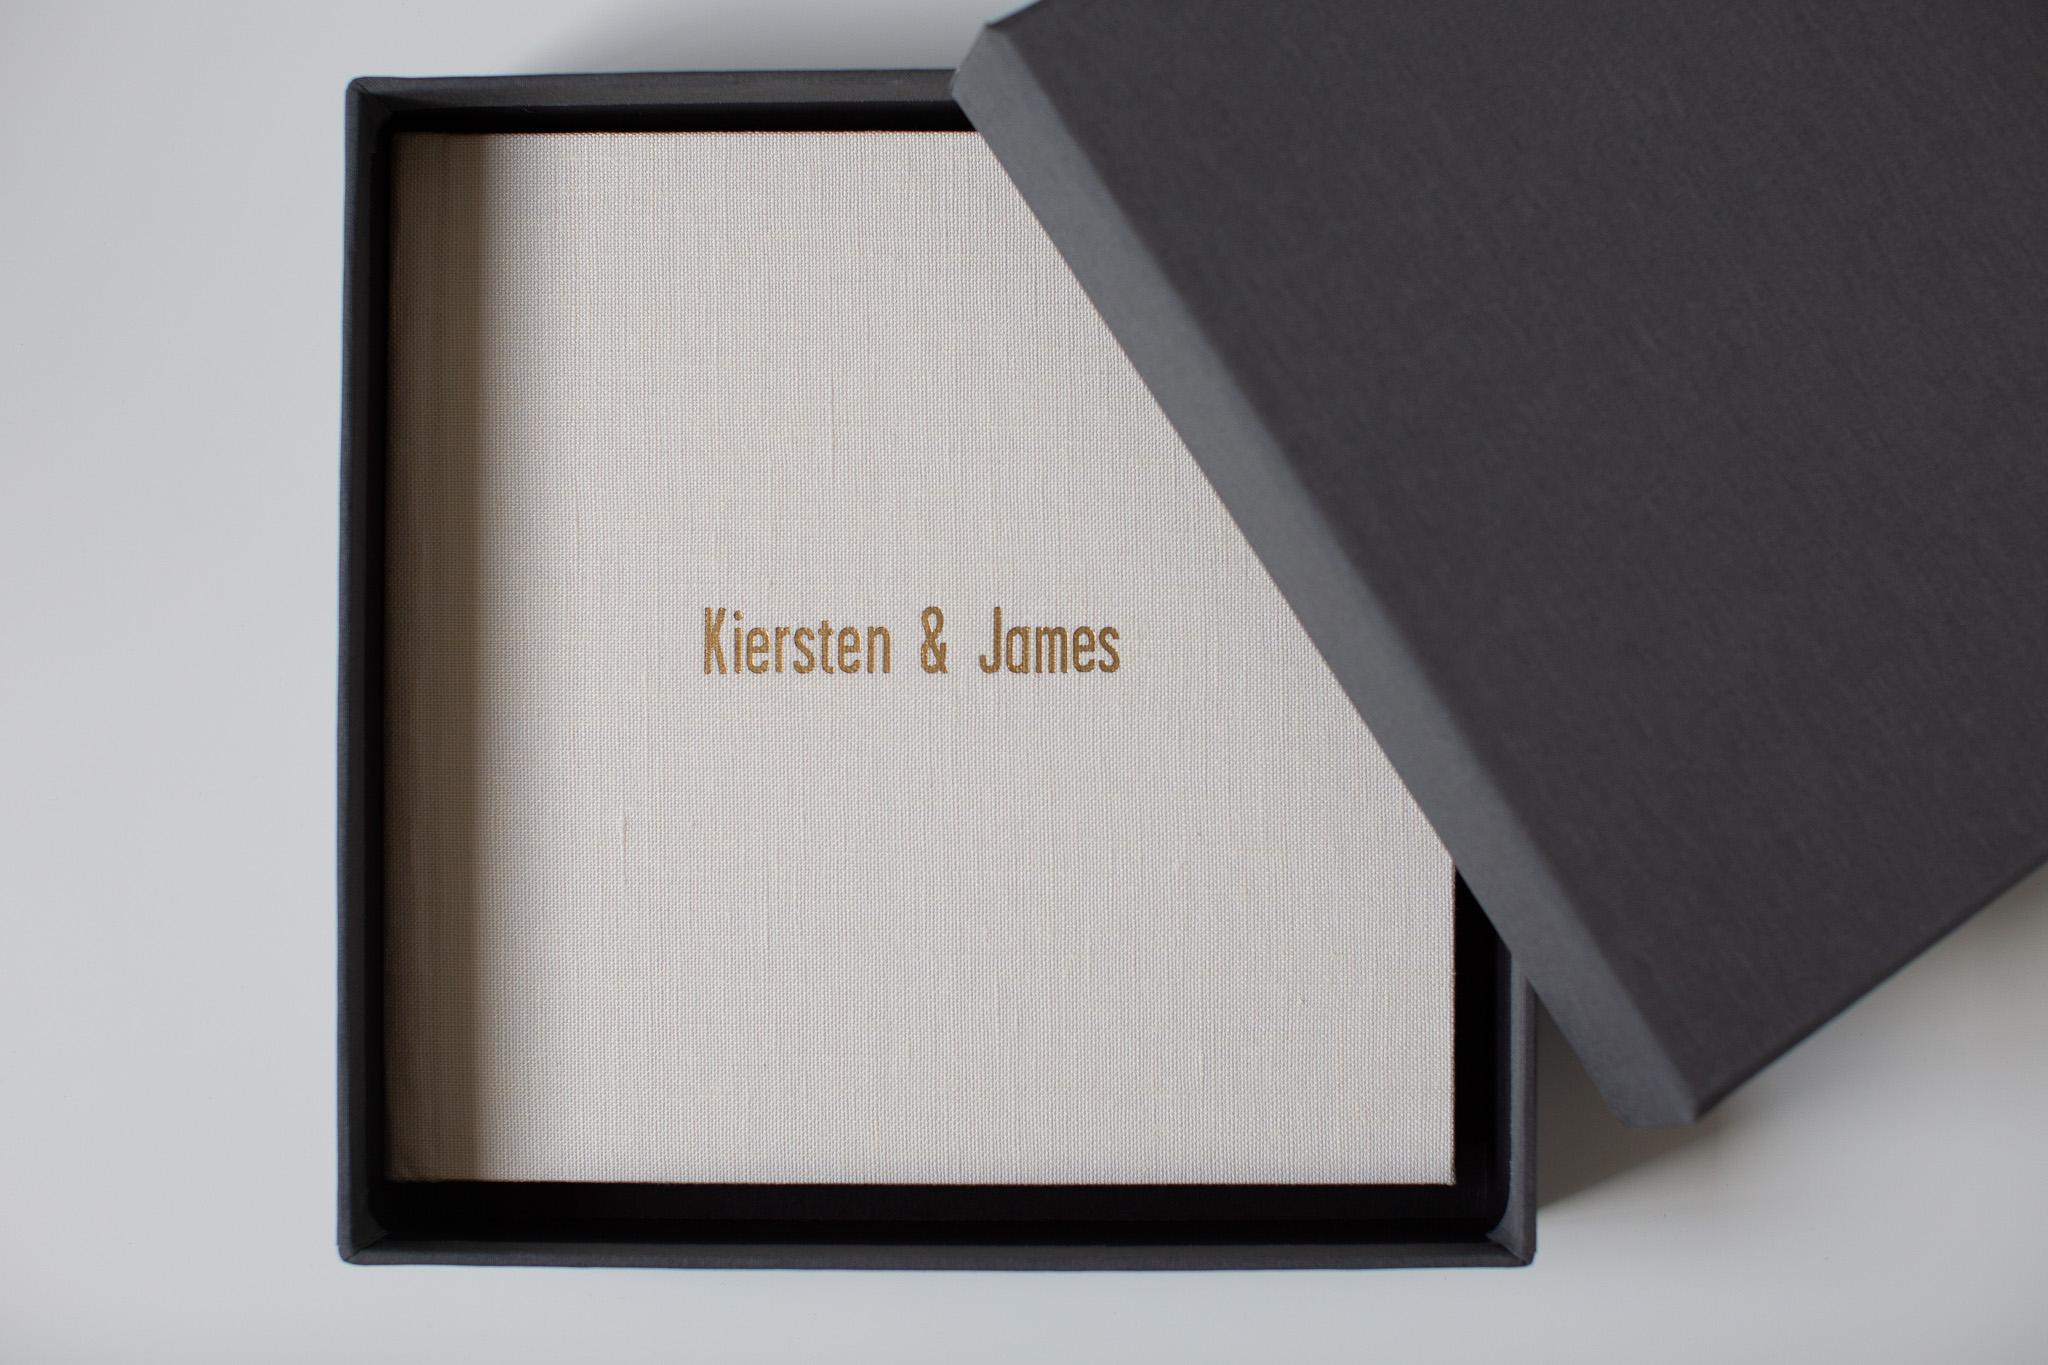 albumsbooks_JTP2019_009.jpg